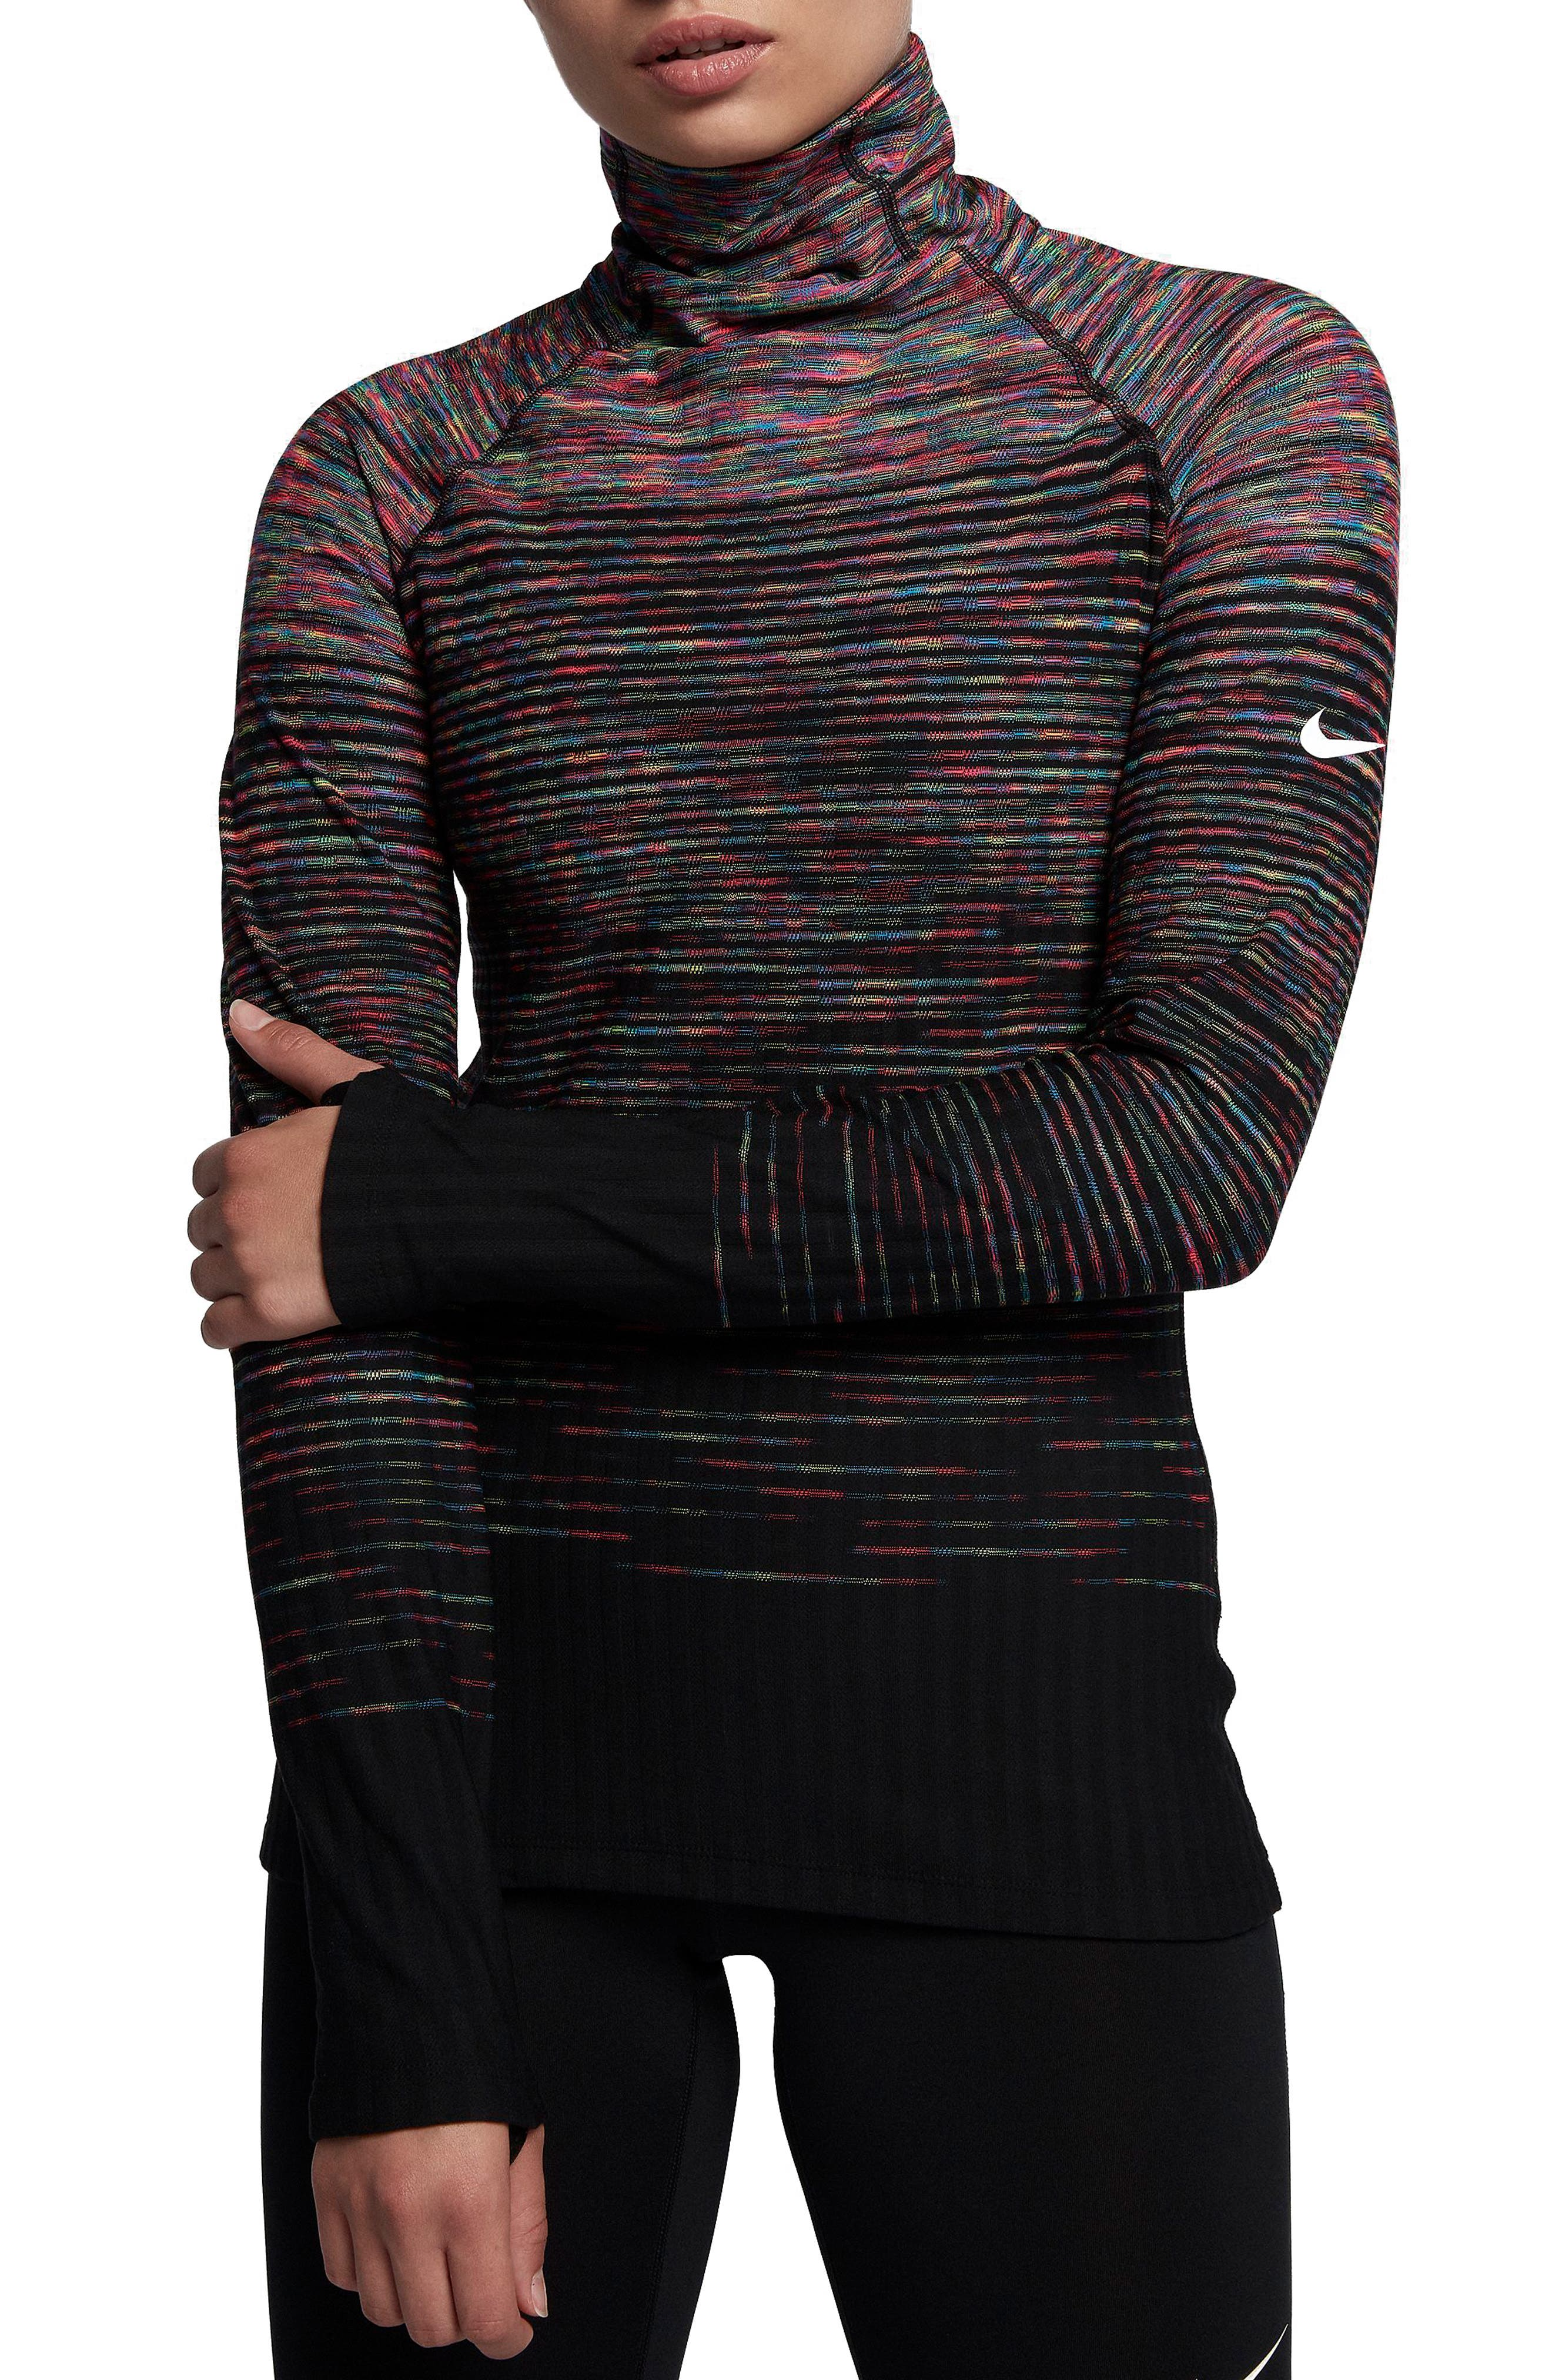 Nike Pro HyperWarm Long Sleeve Training Top